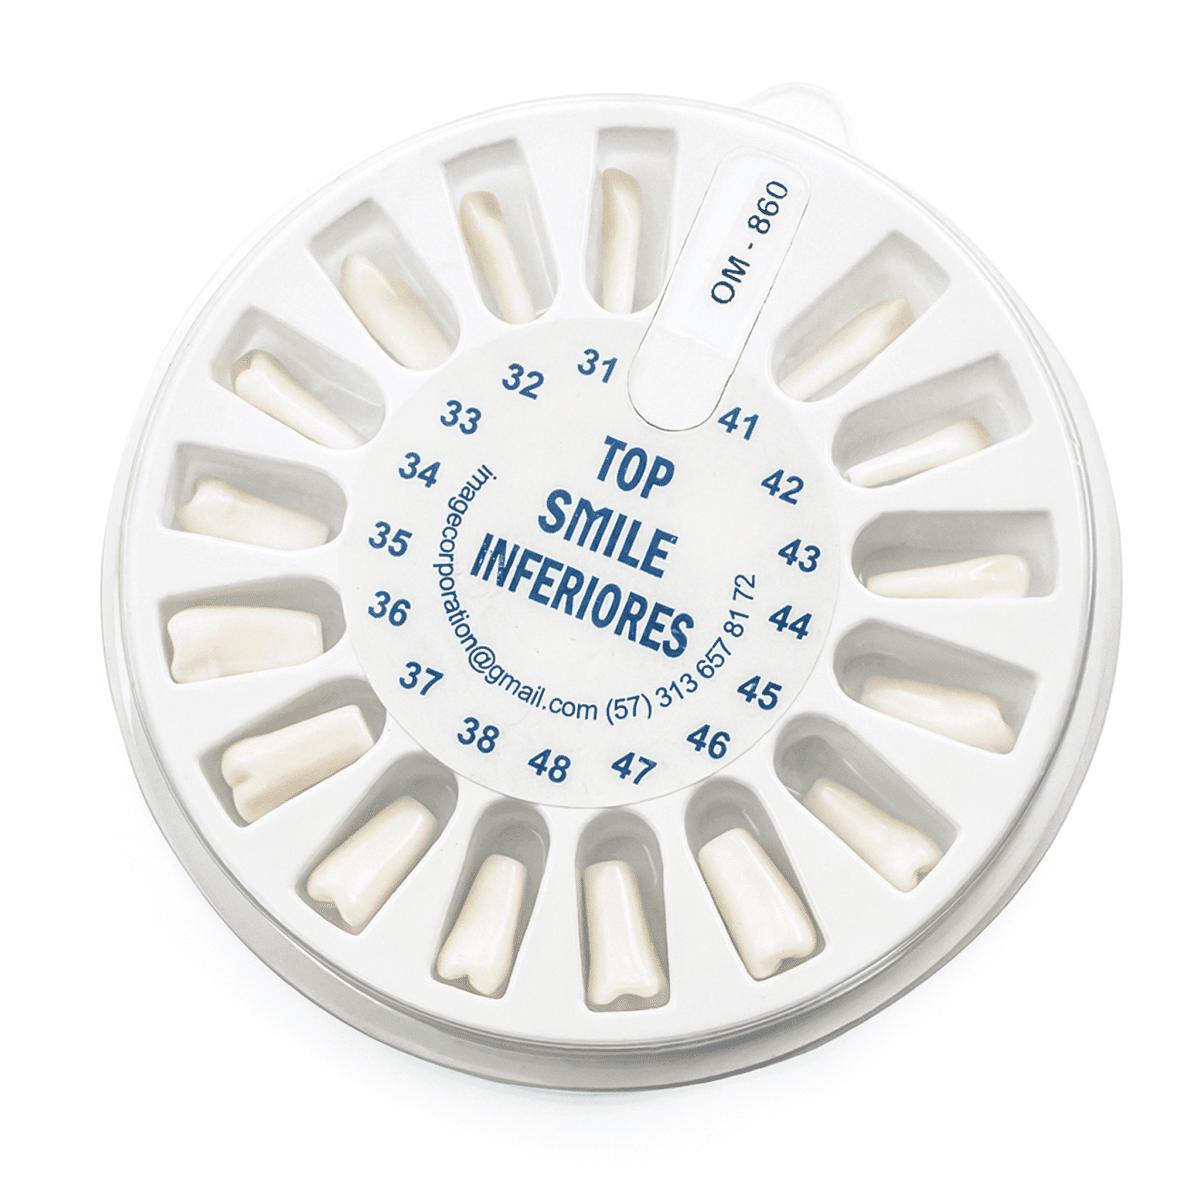 Dientes Tipodonto 860 -Marca: Genérica Articuladores | Odontology BG